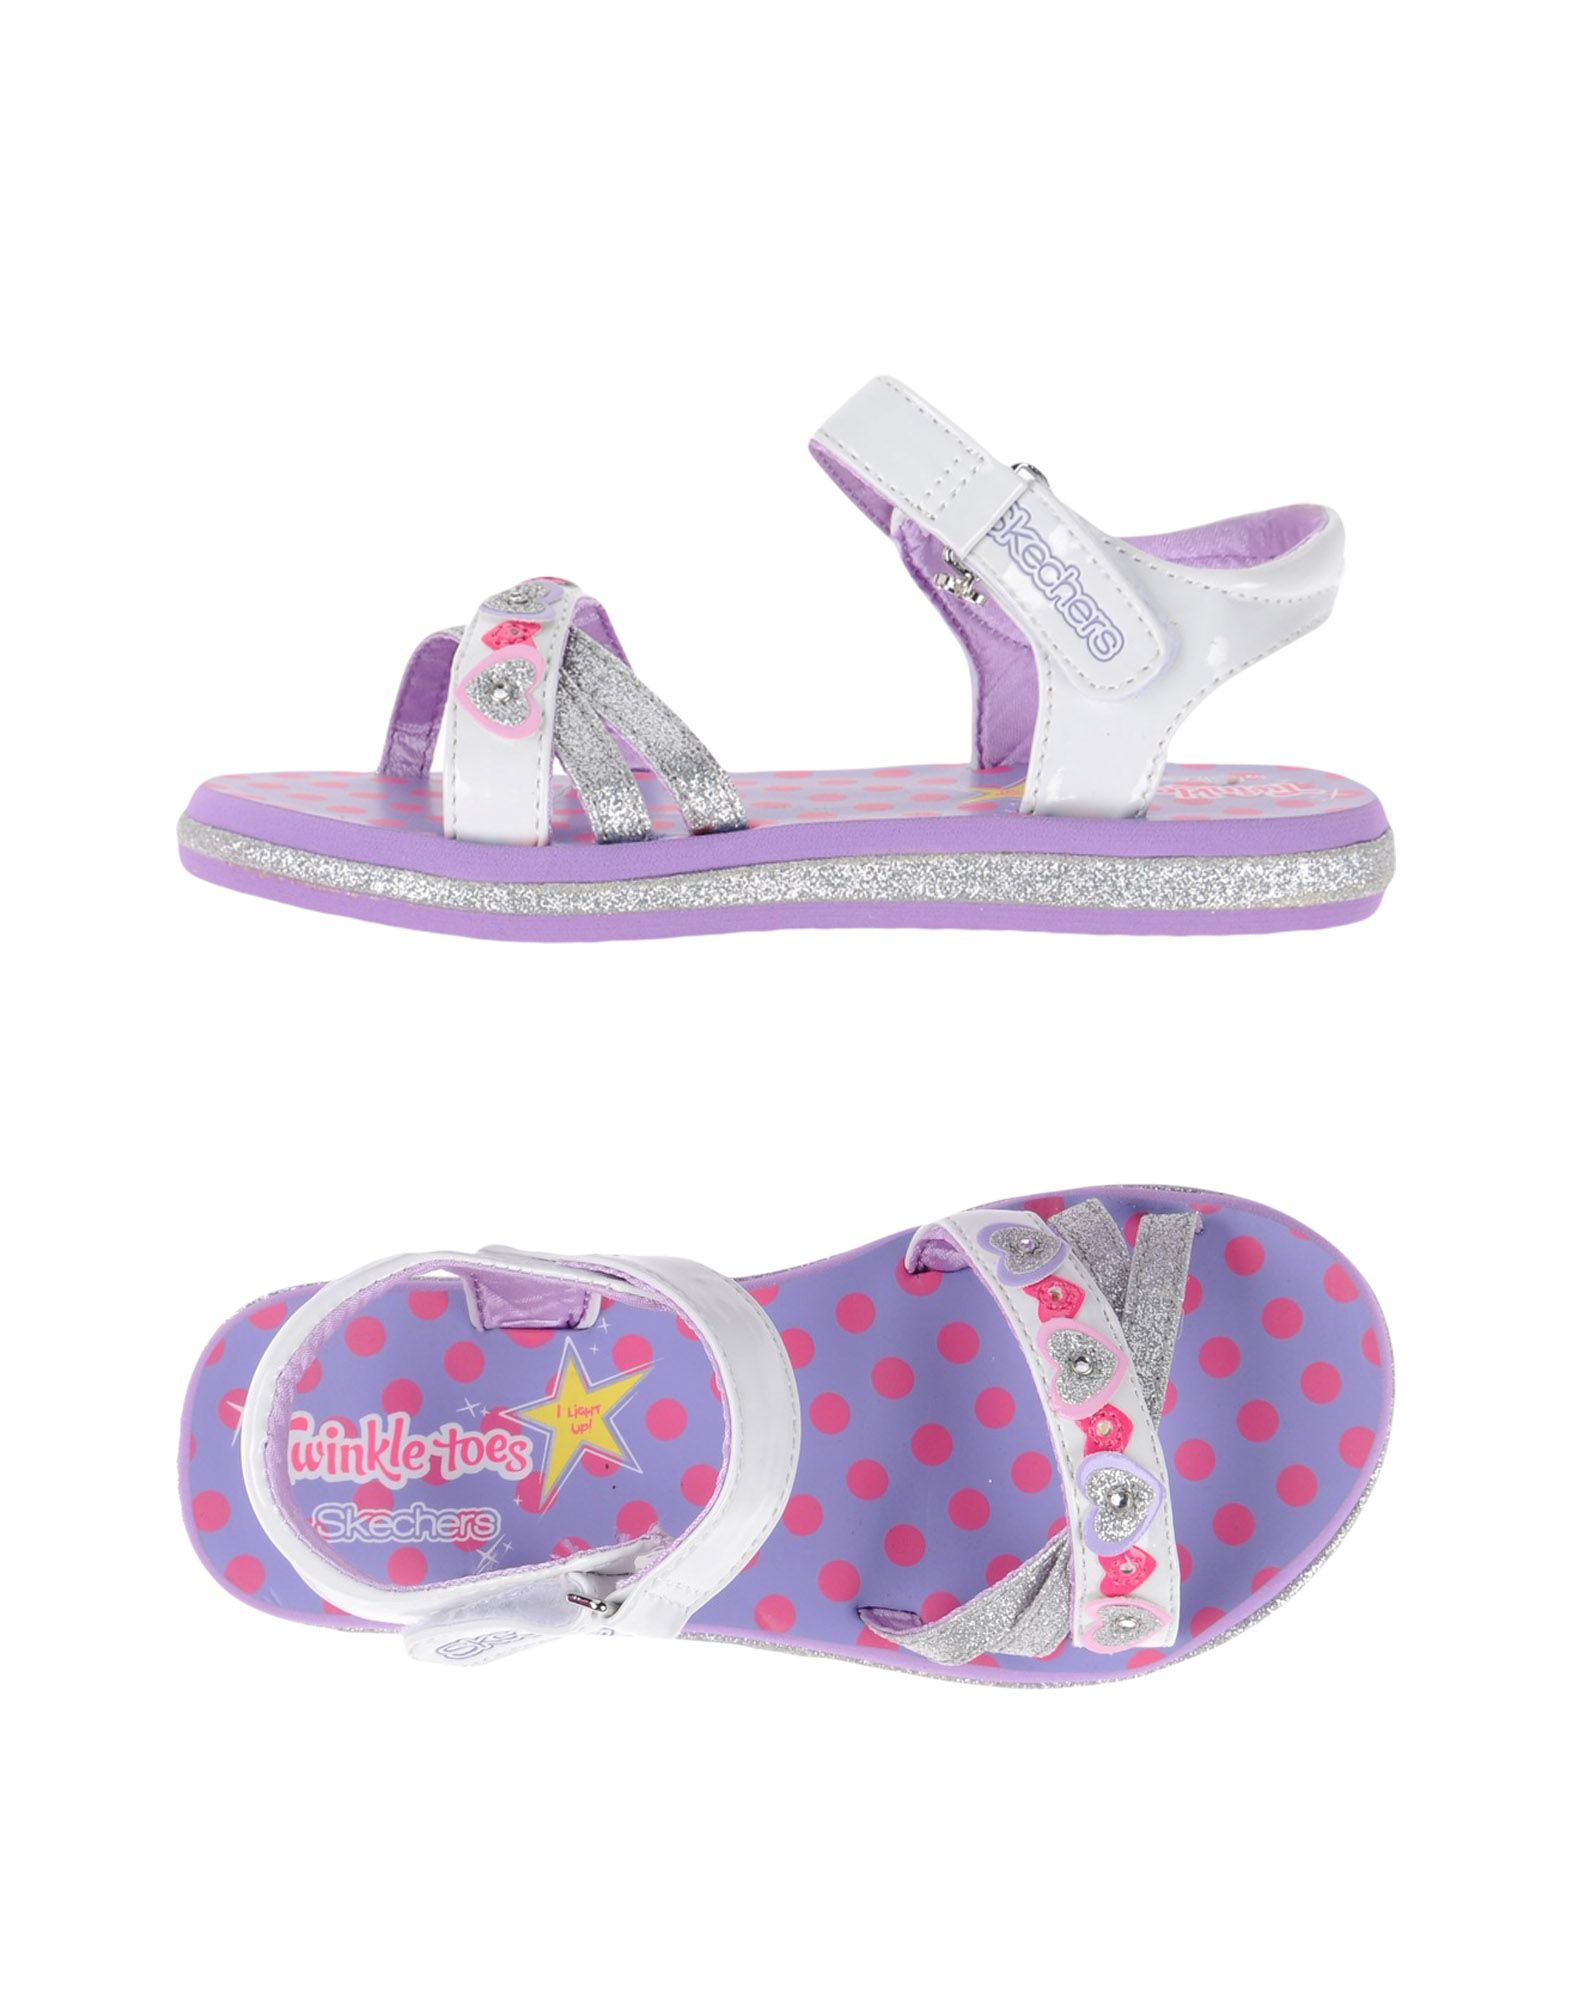 f098f7a291c1a2 Skechers Sandals - Women Skechers Sandals online on YOOX Belgium -  11209273ES